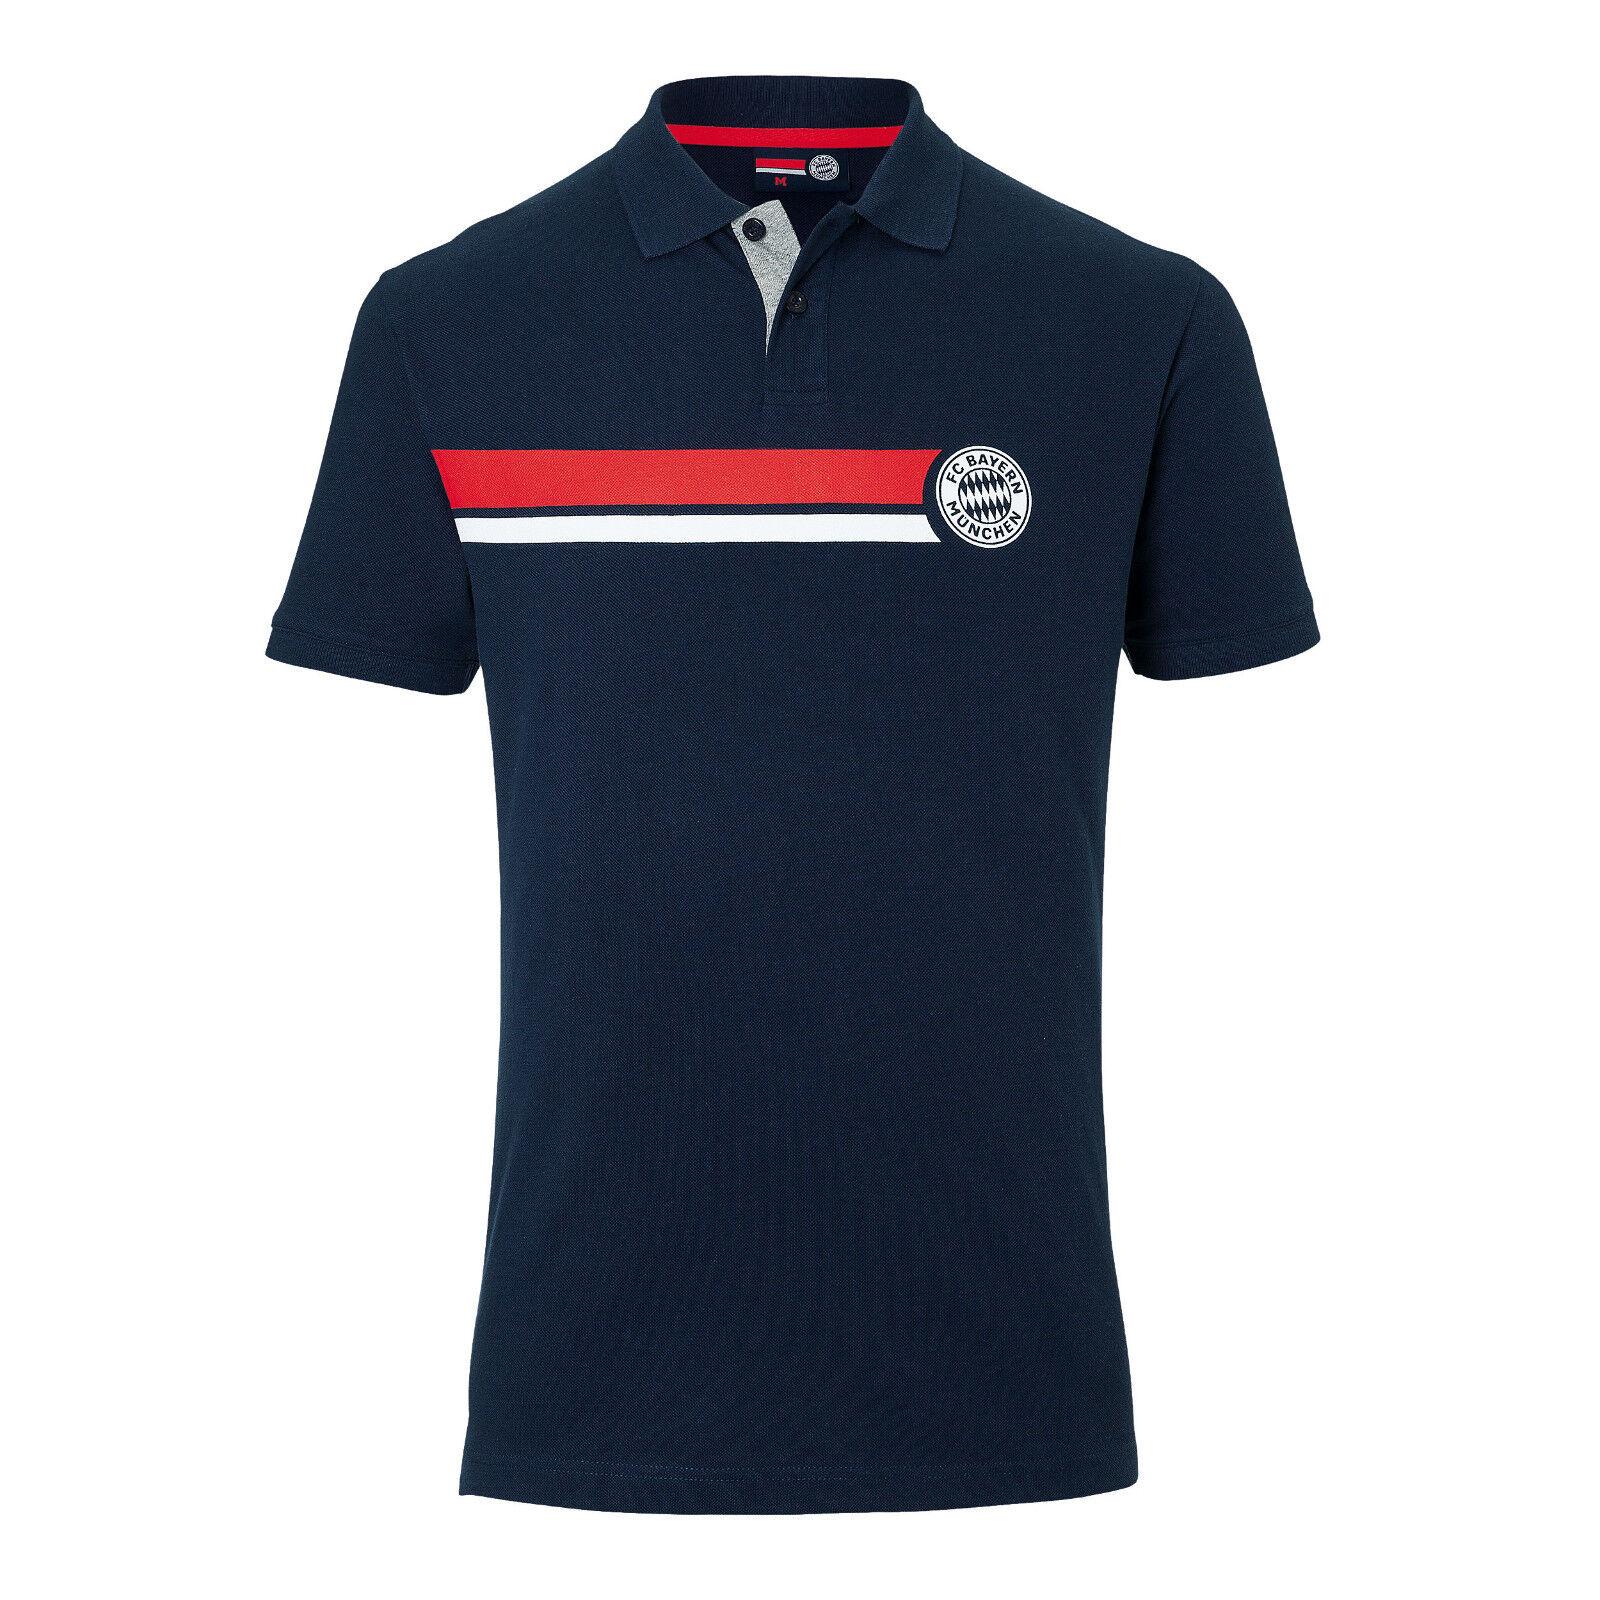 3f08d4cbf0a3d Original FC Bayern München Poloshirt Stripes FCB nvwzhm2043-Fußball-Fanshop